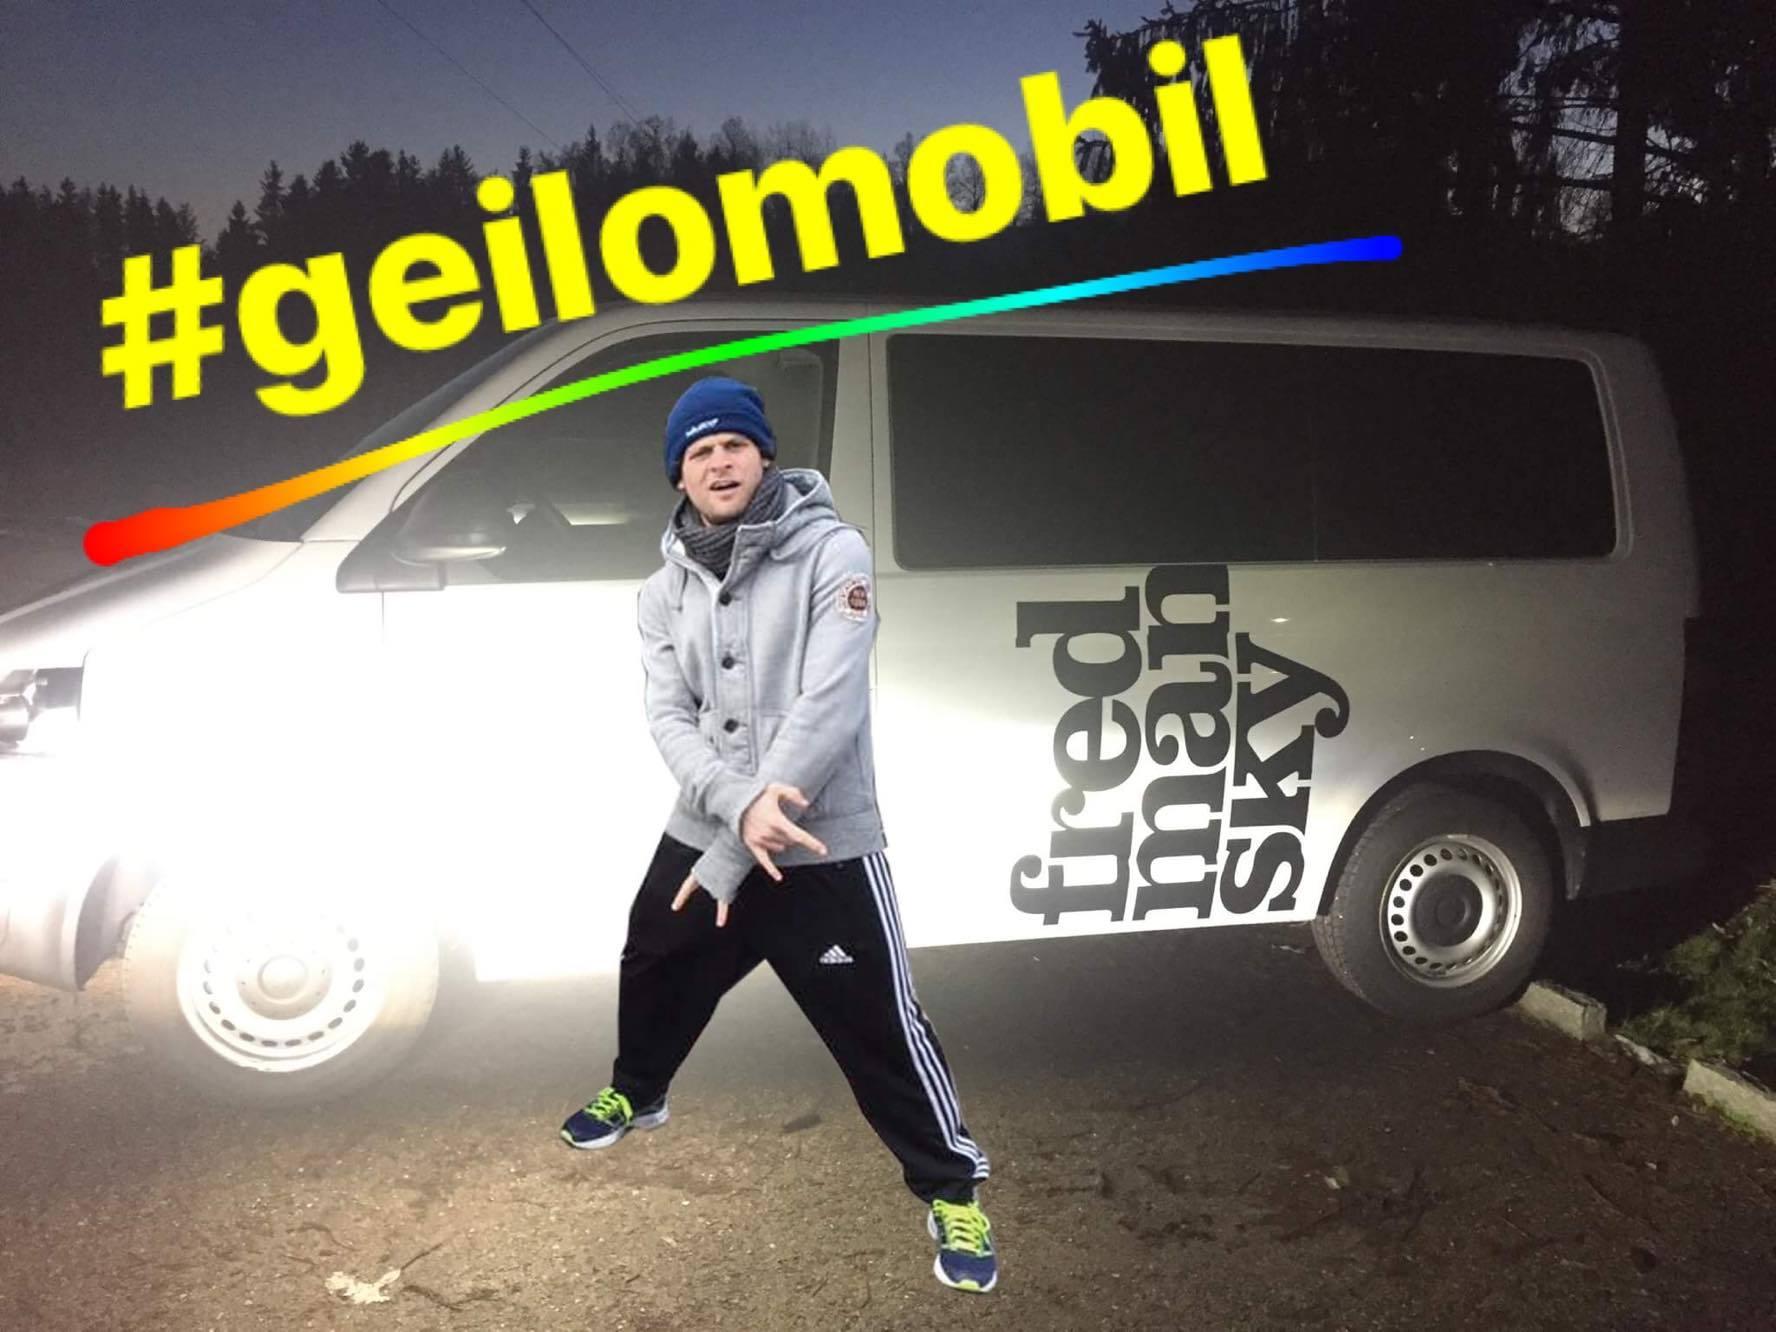 Fredmansky Geilomobil